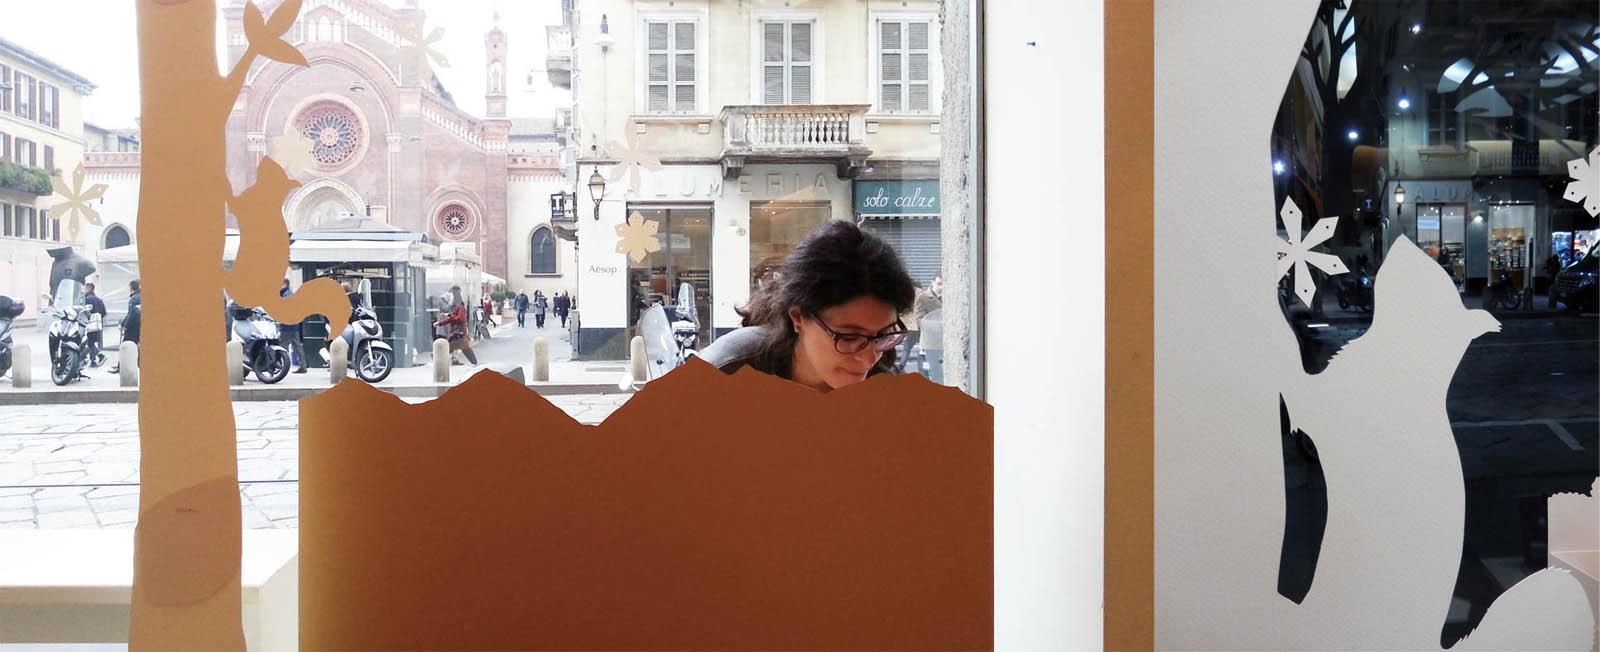 inverno-papercut-fabriano-vetrine-wonderland-milano (9)